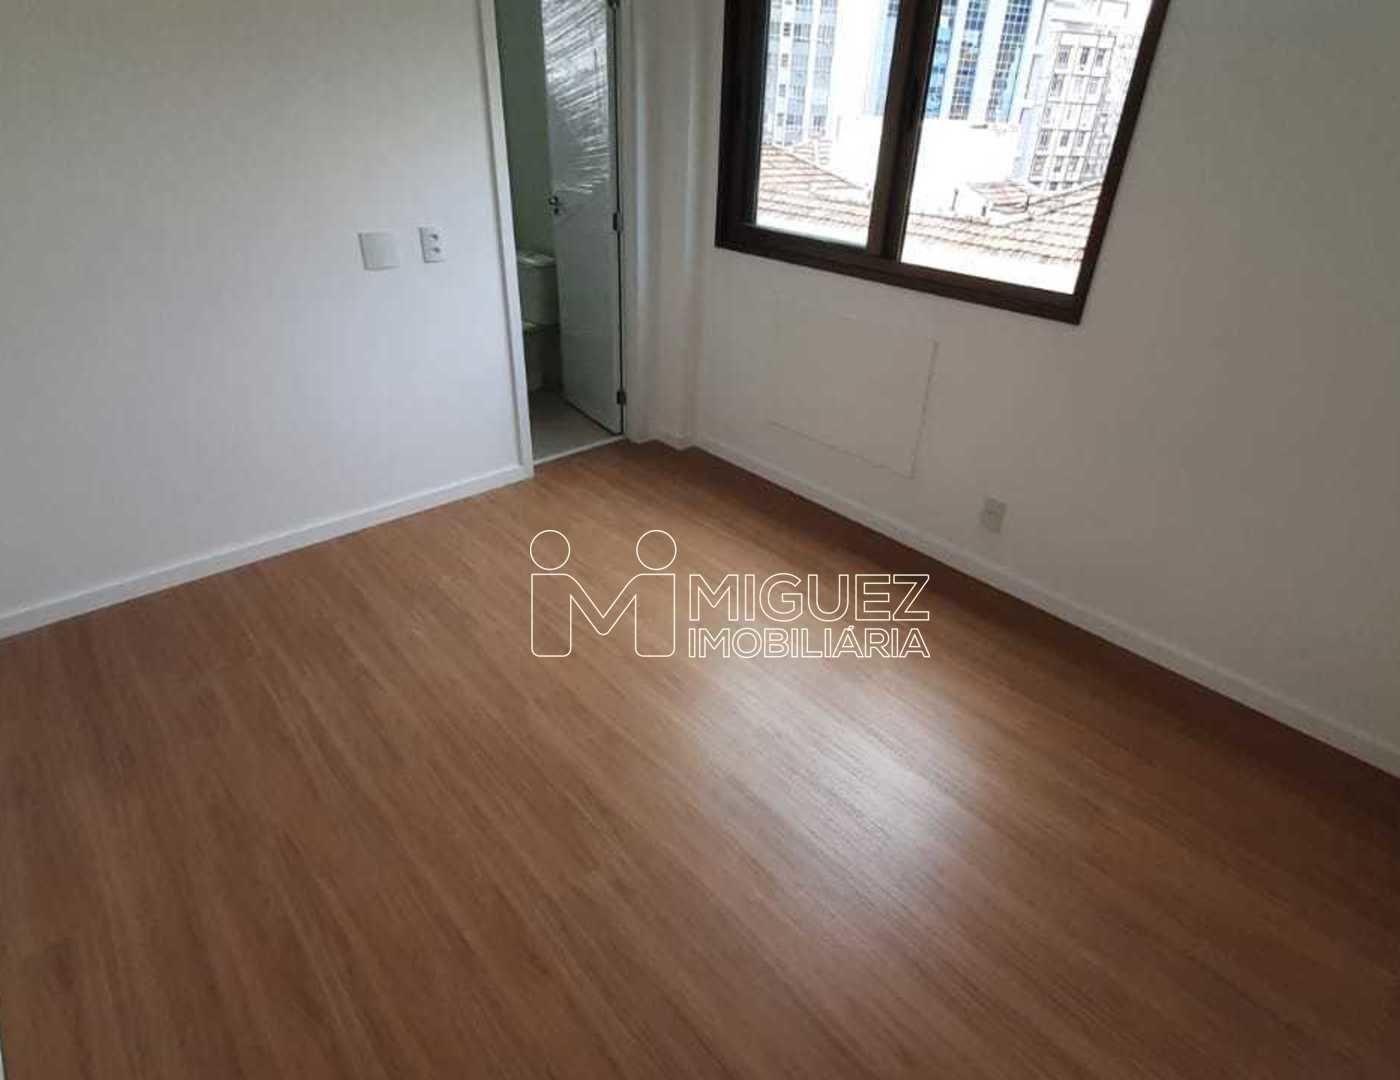 Apartamento, venda, Rua dos Araujos - Tijuca , Rio de janeiro